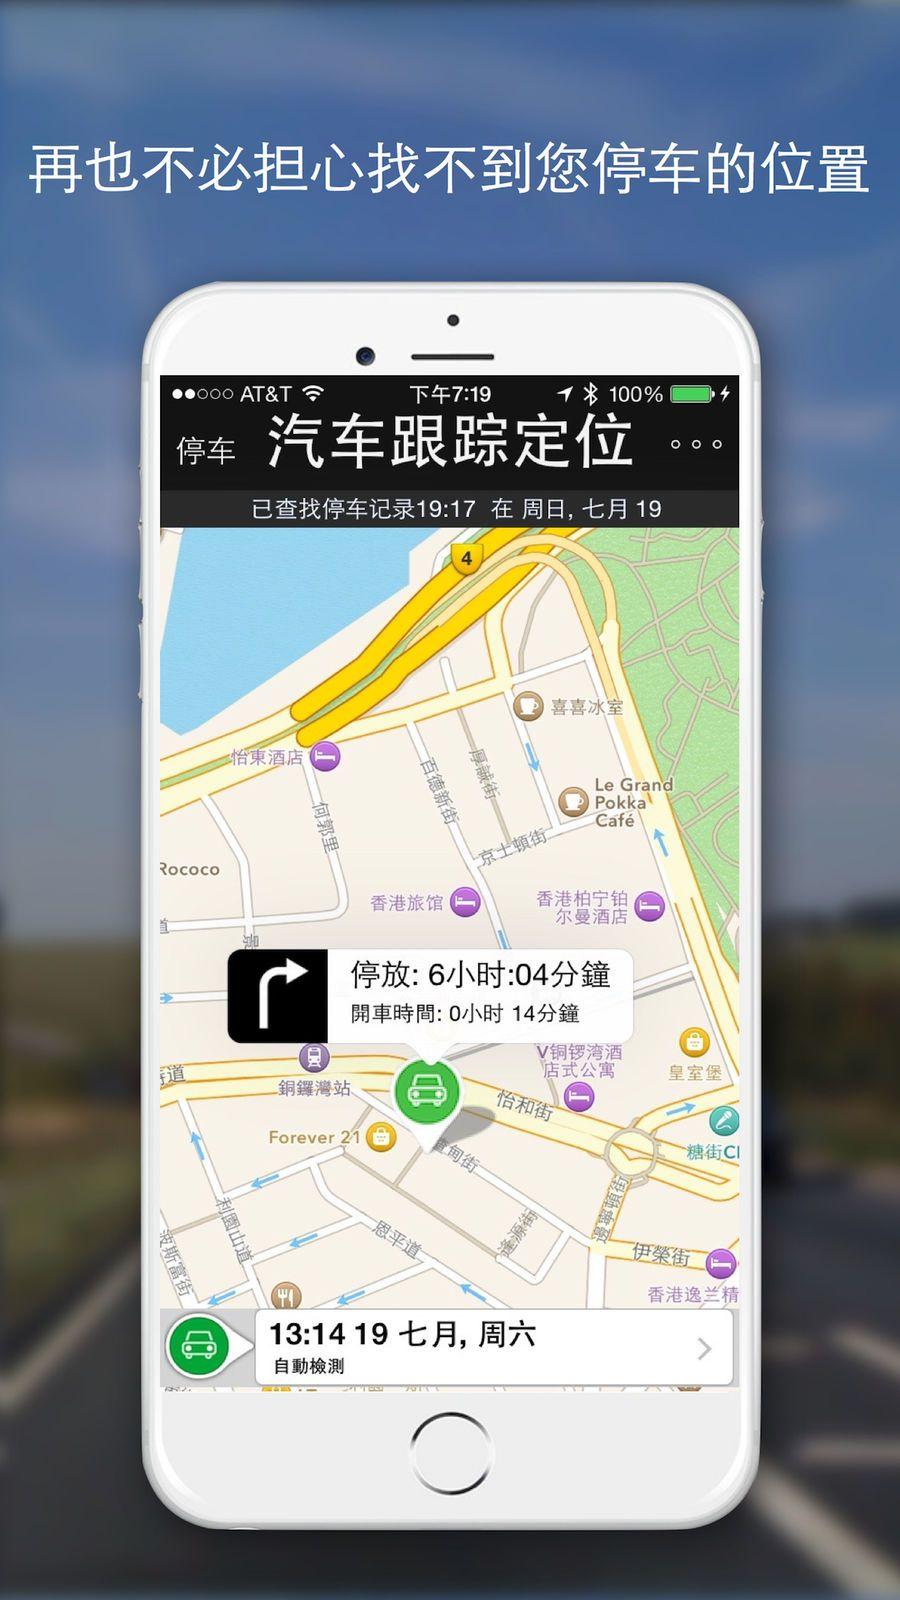 ÕÆÉÏÍ£³µ±¦ ÕÆÉÏUtilitiesNavigationapps App, Gaming